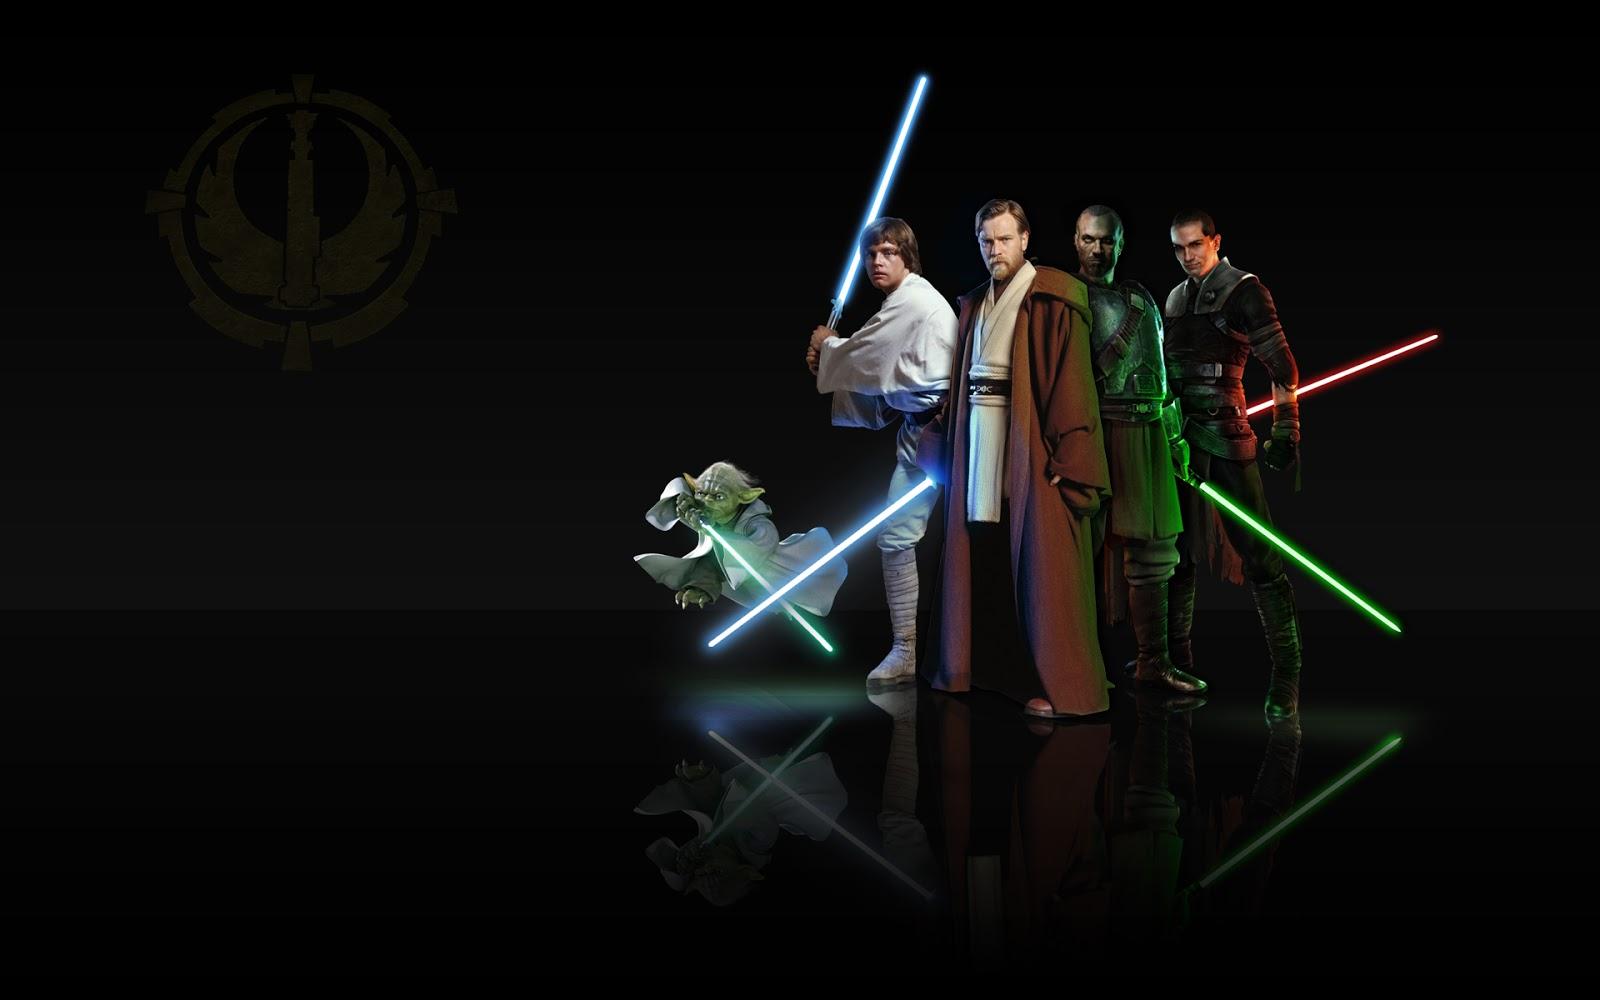 Papel de Parede HD: Wallpapers Star Wars   Papel de Parede Star Wars